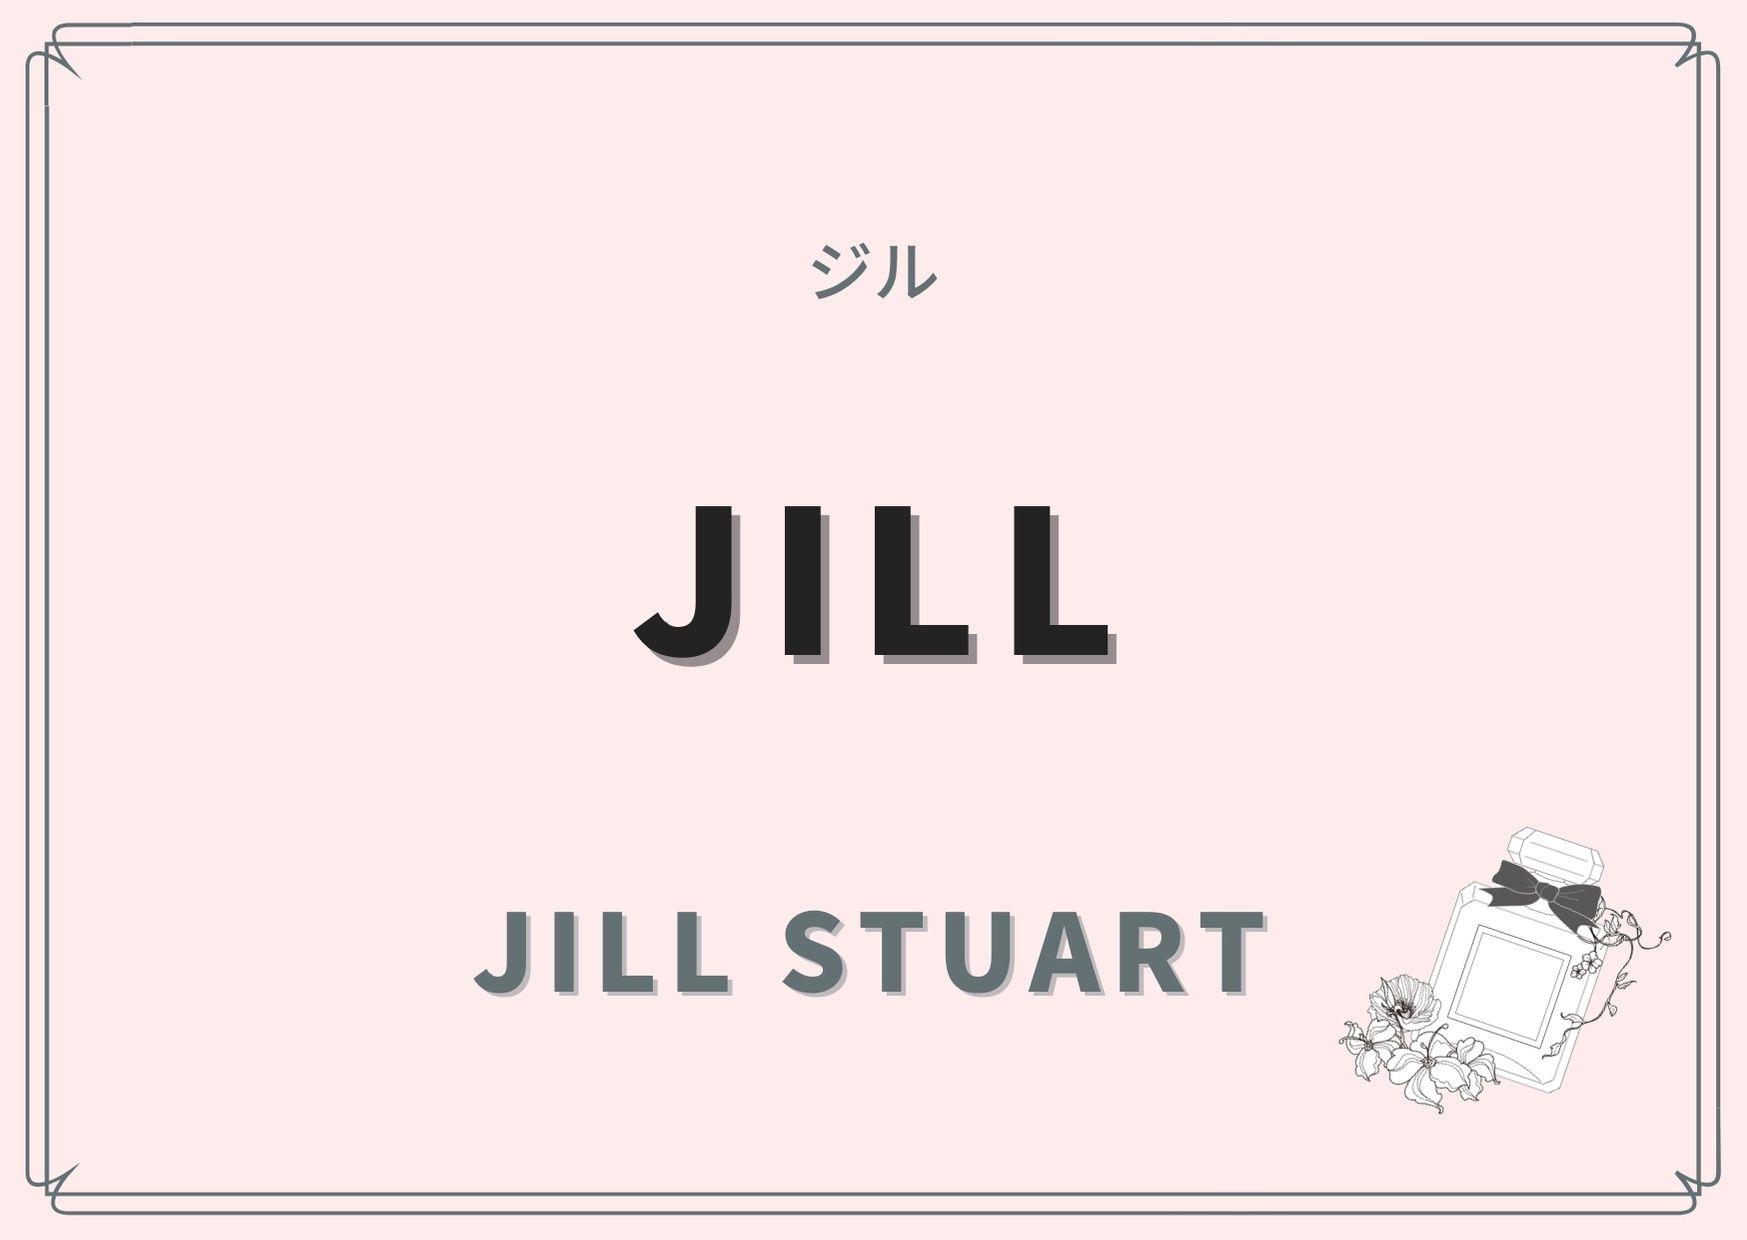 Jill(ジル)/JILL STUART(ジル スチュアート)